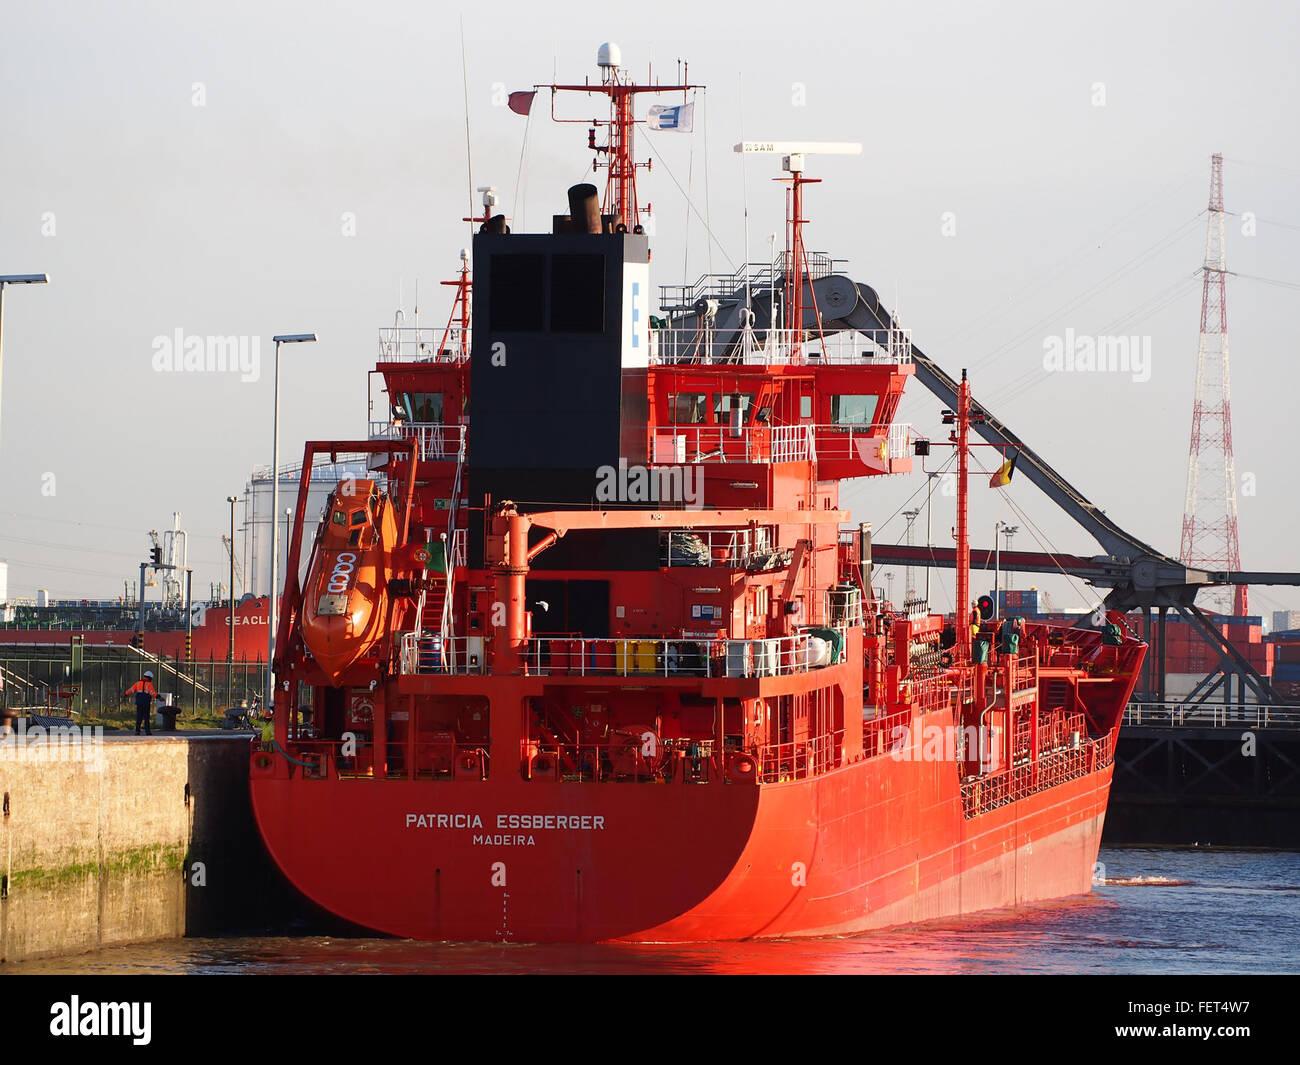 Patricia Essberger (ship, 2000) IMO 9212486 Boudewijnsluis, Port of Antwerp pic4 - Stock Image